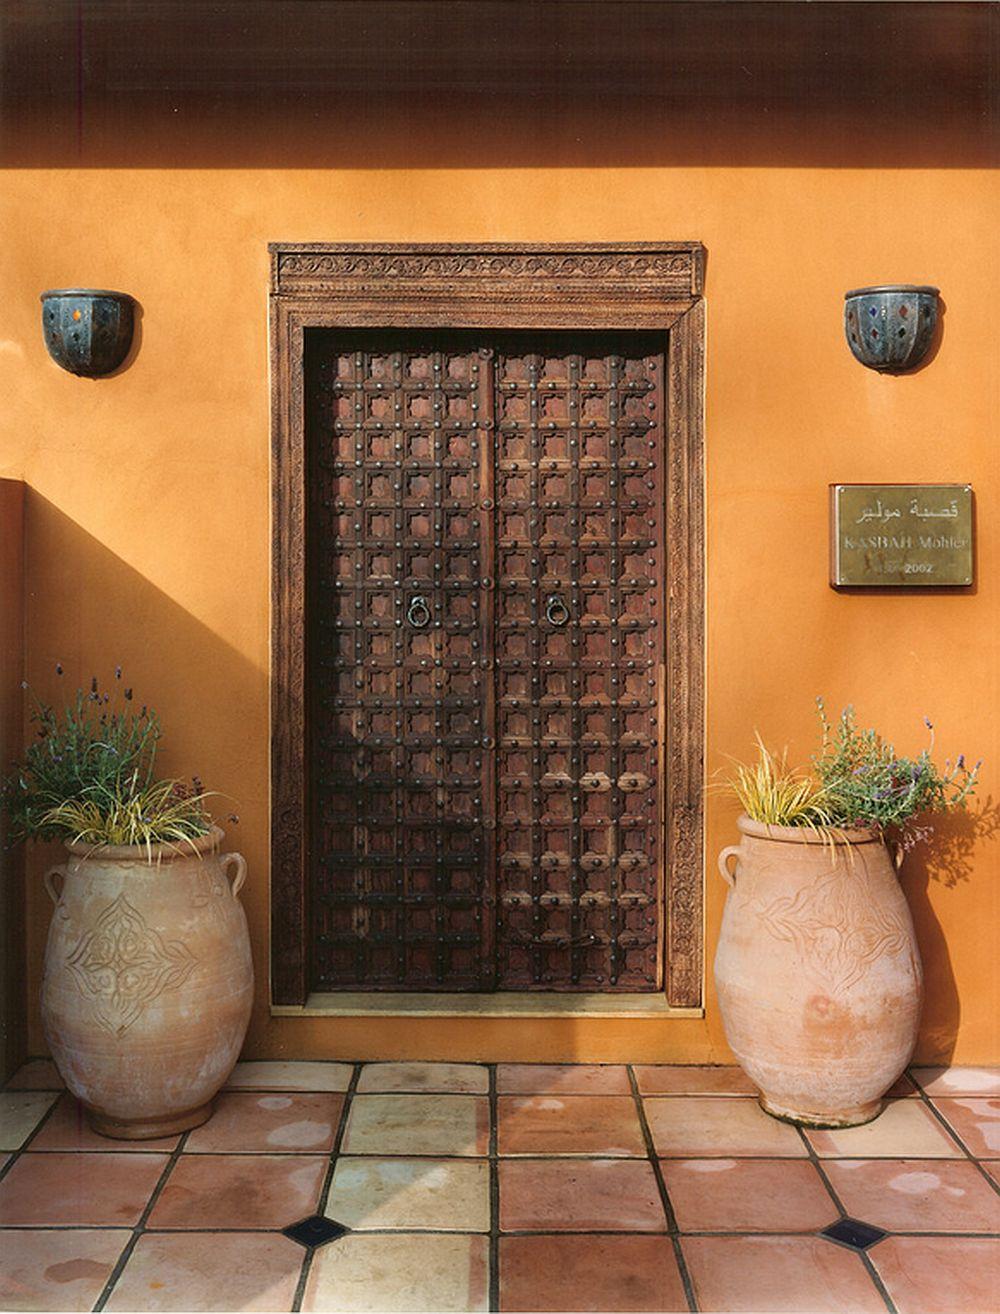 adelaparvu.com despre casa in stil marocan, maroccan kasbah, design interior Barry Johnson, arh Louie Leu, Foto Sharon Risedorph (10)